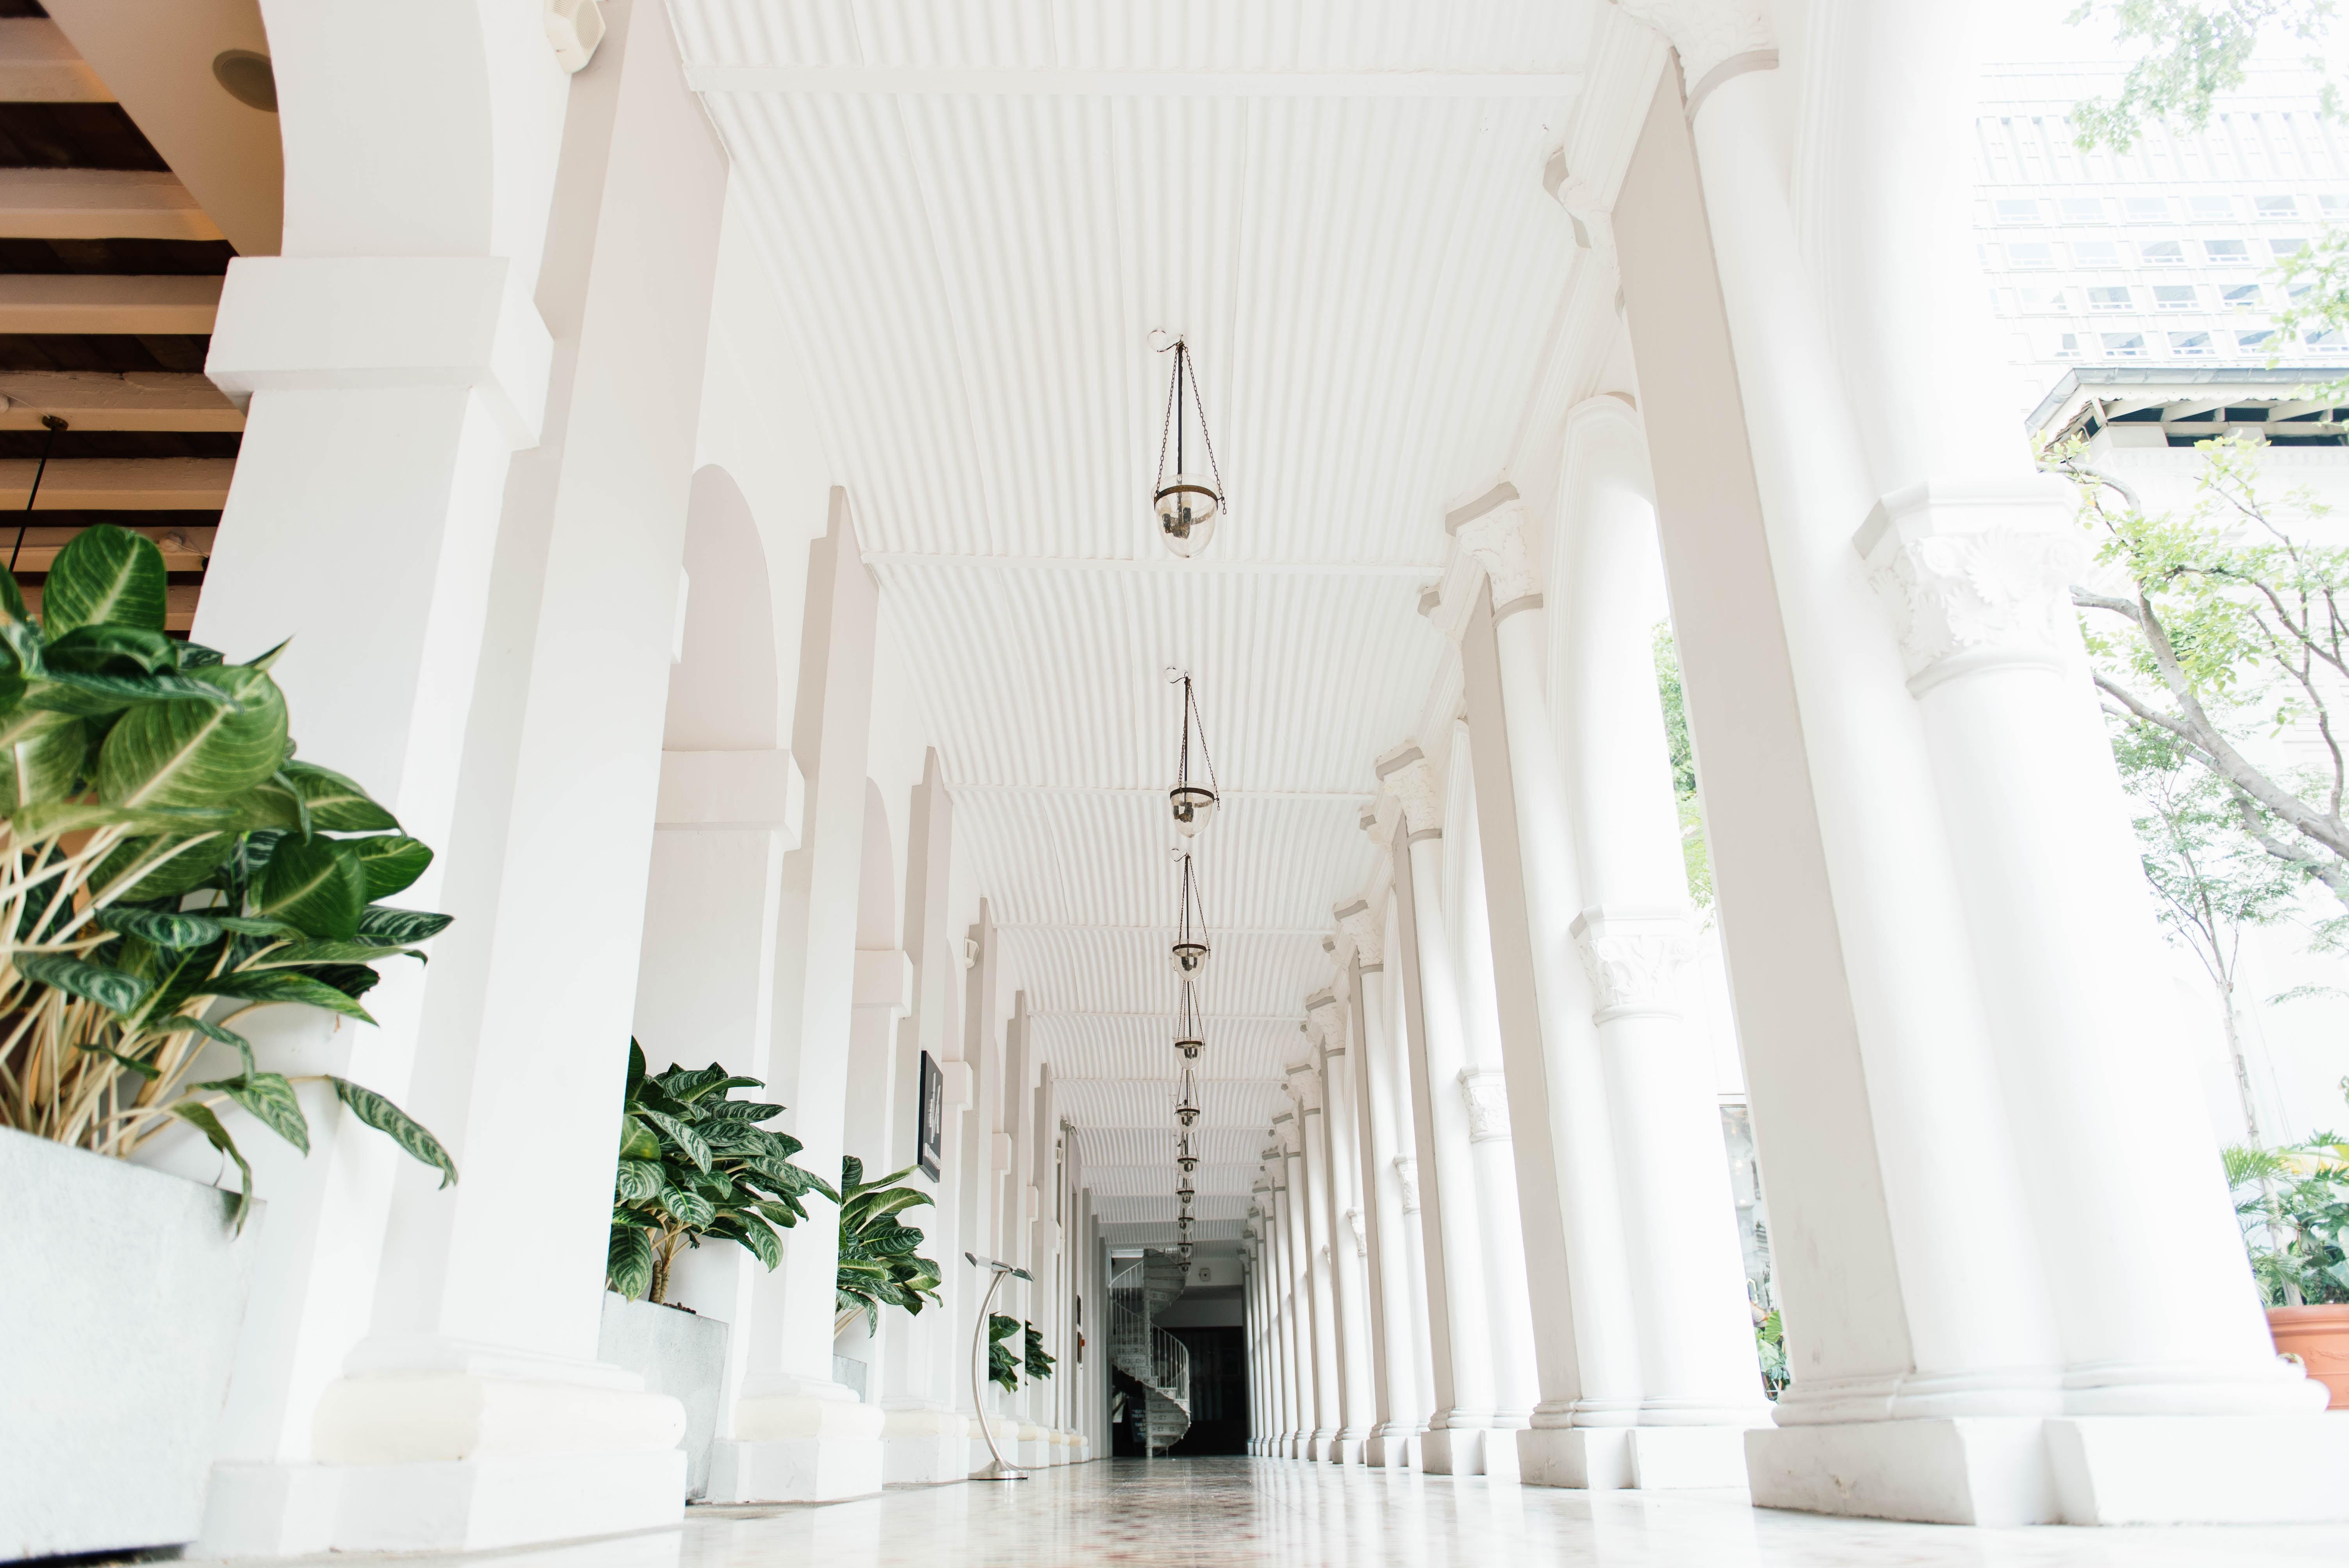 white ceramic tiles on hallway with pillars